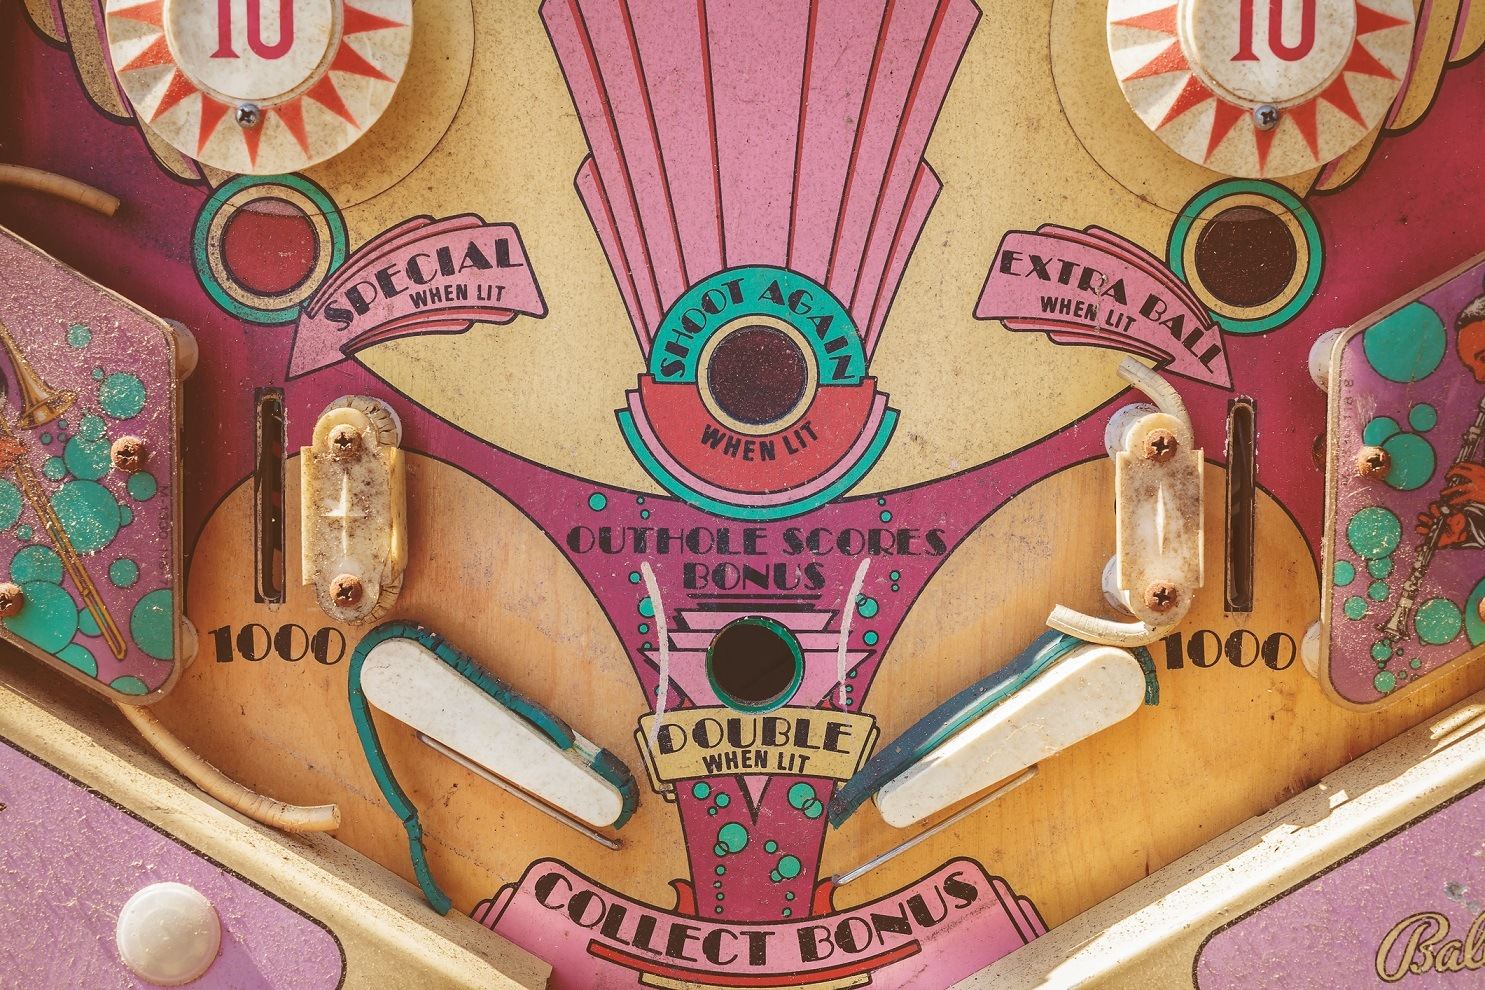 Close up of a weathered vintage pinball machine